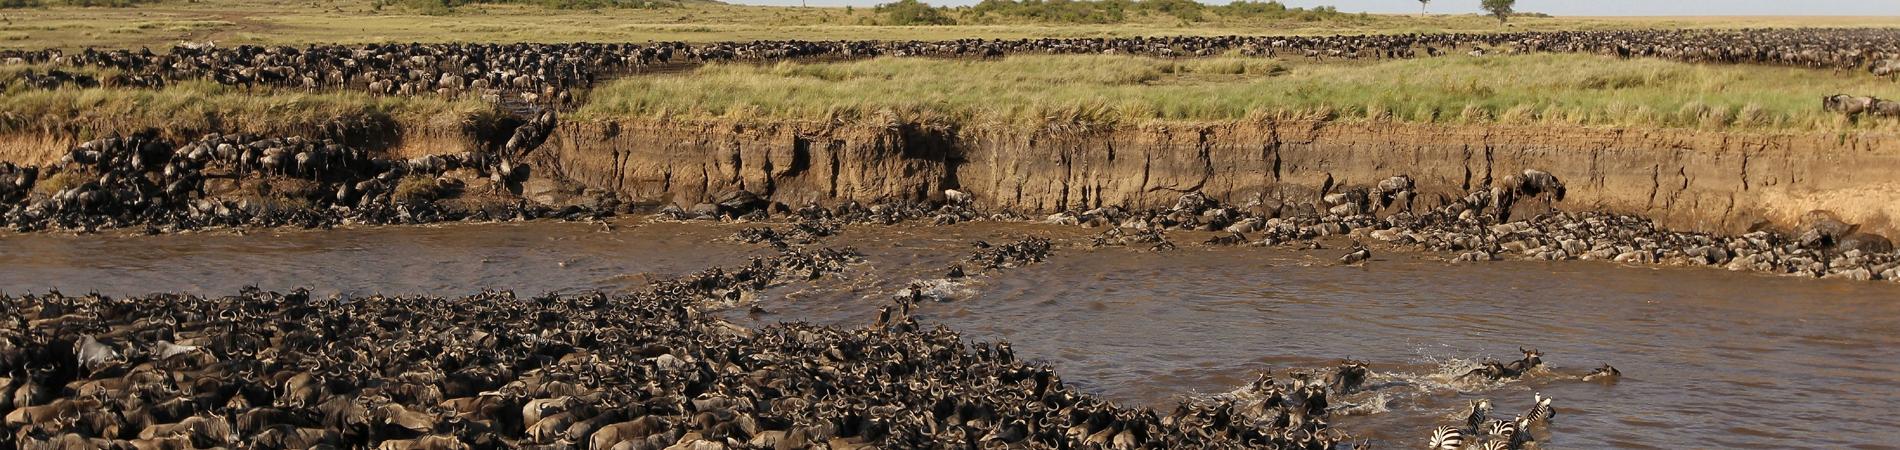 shutterstock tz wildebeest migration